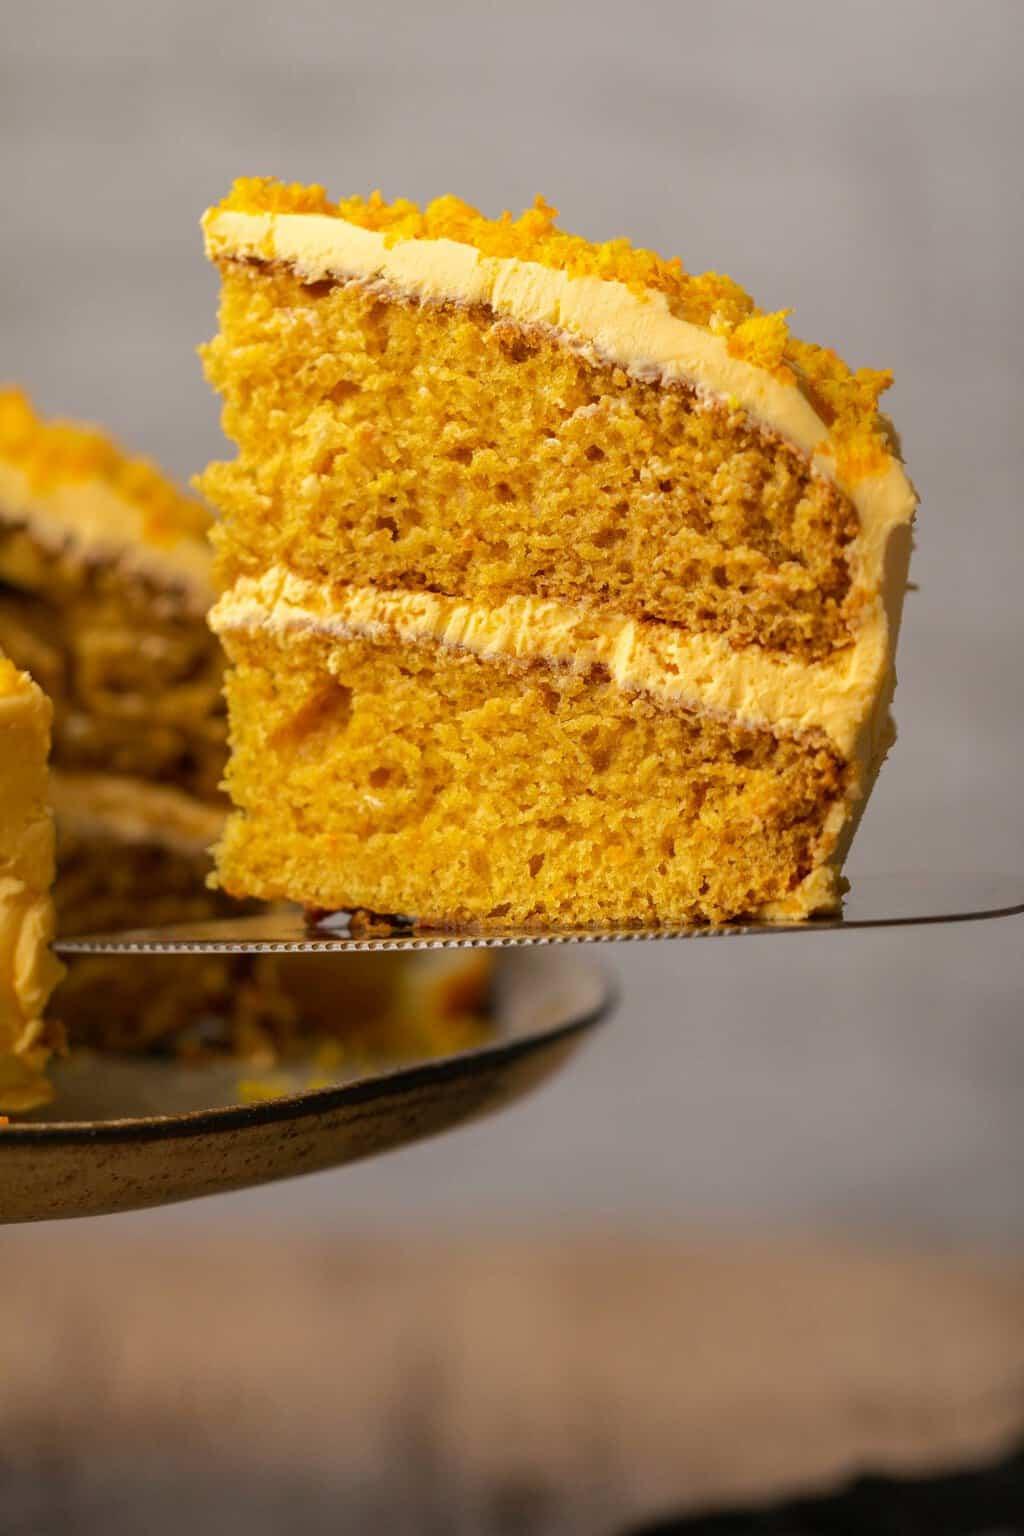 Slice of vegan orange cake on a cake lifter.